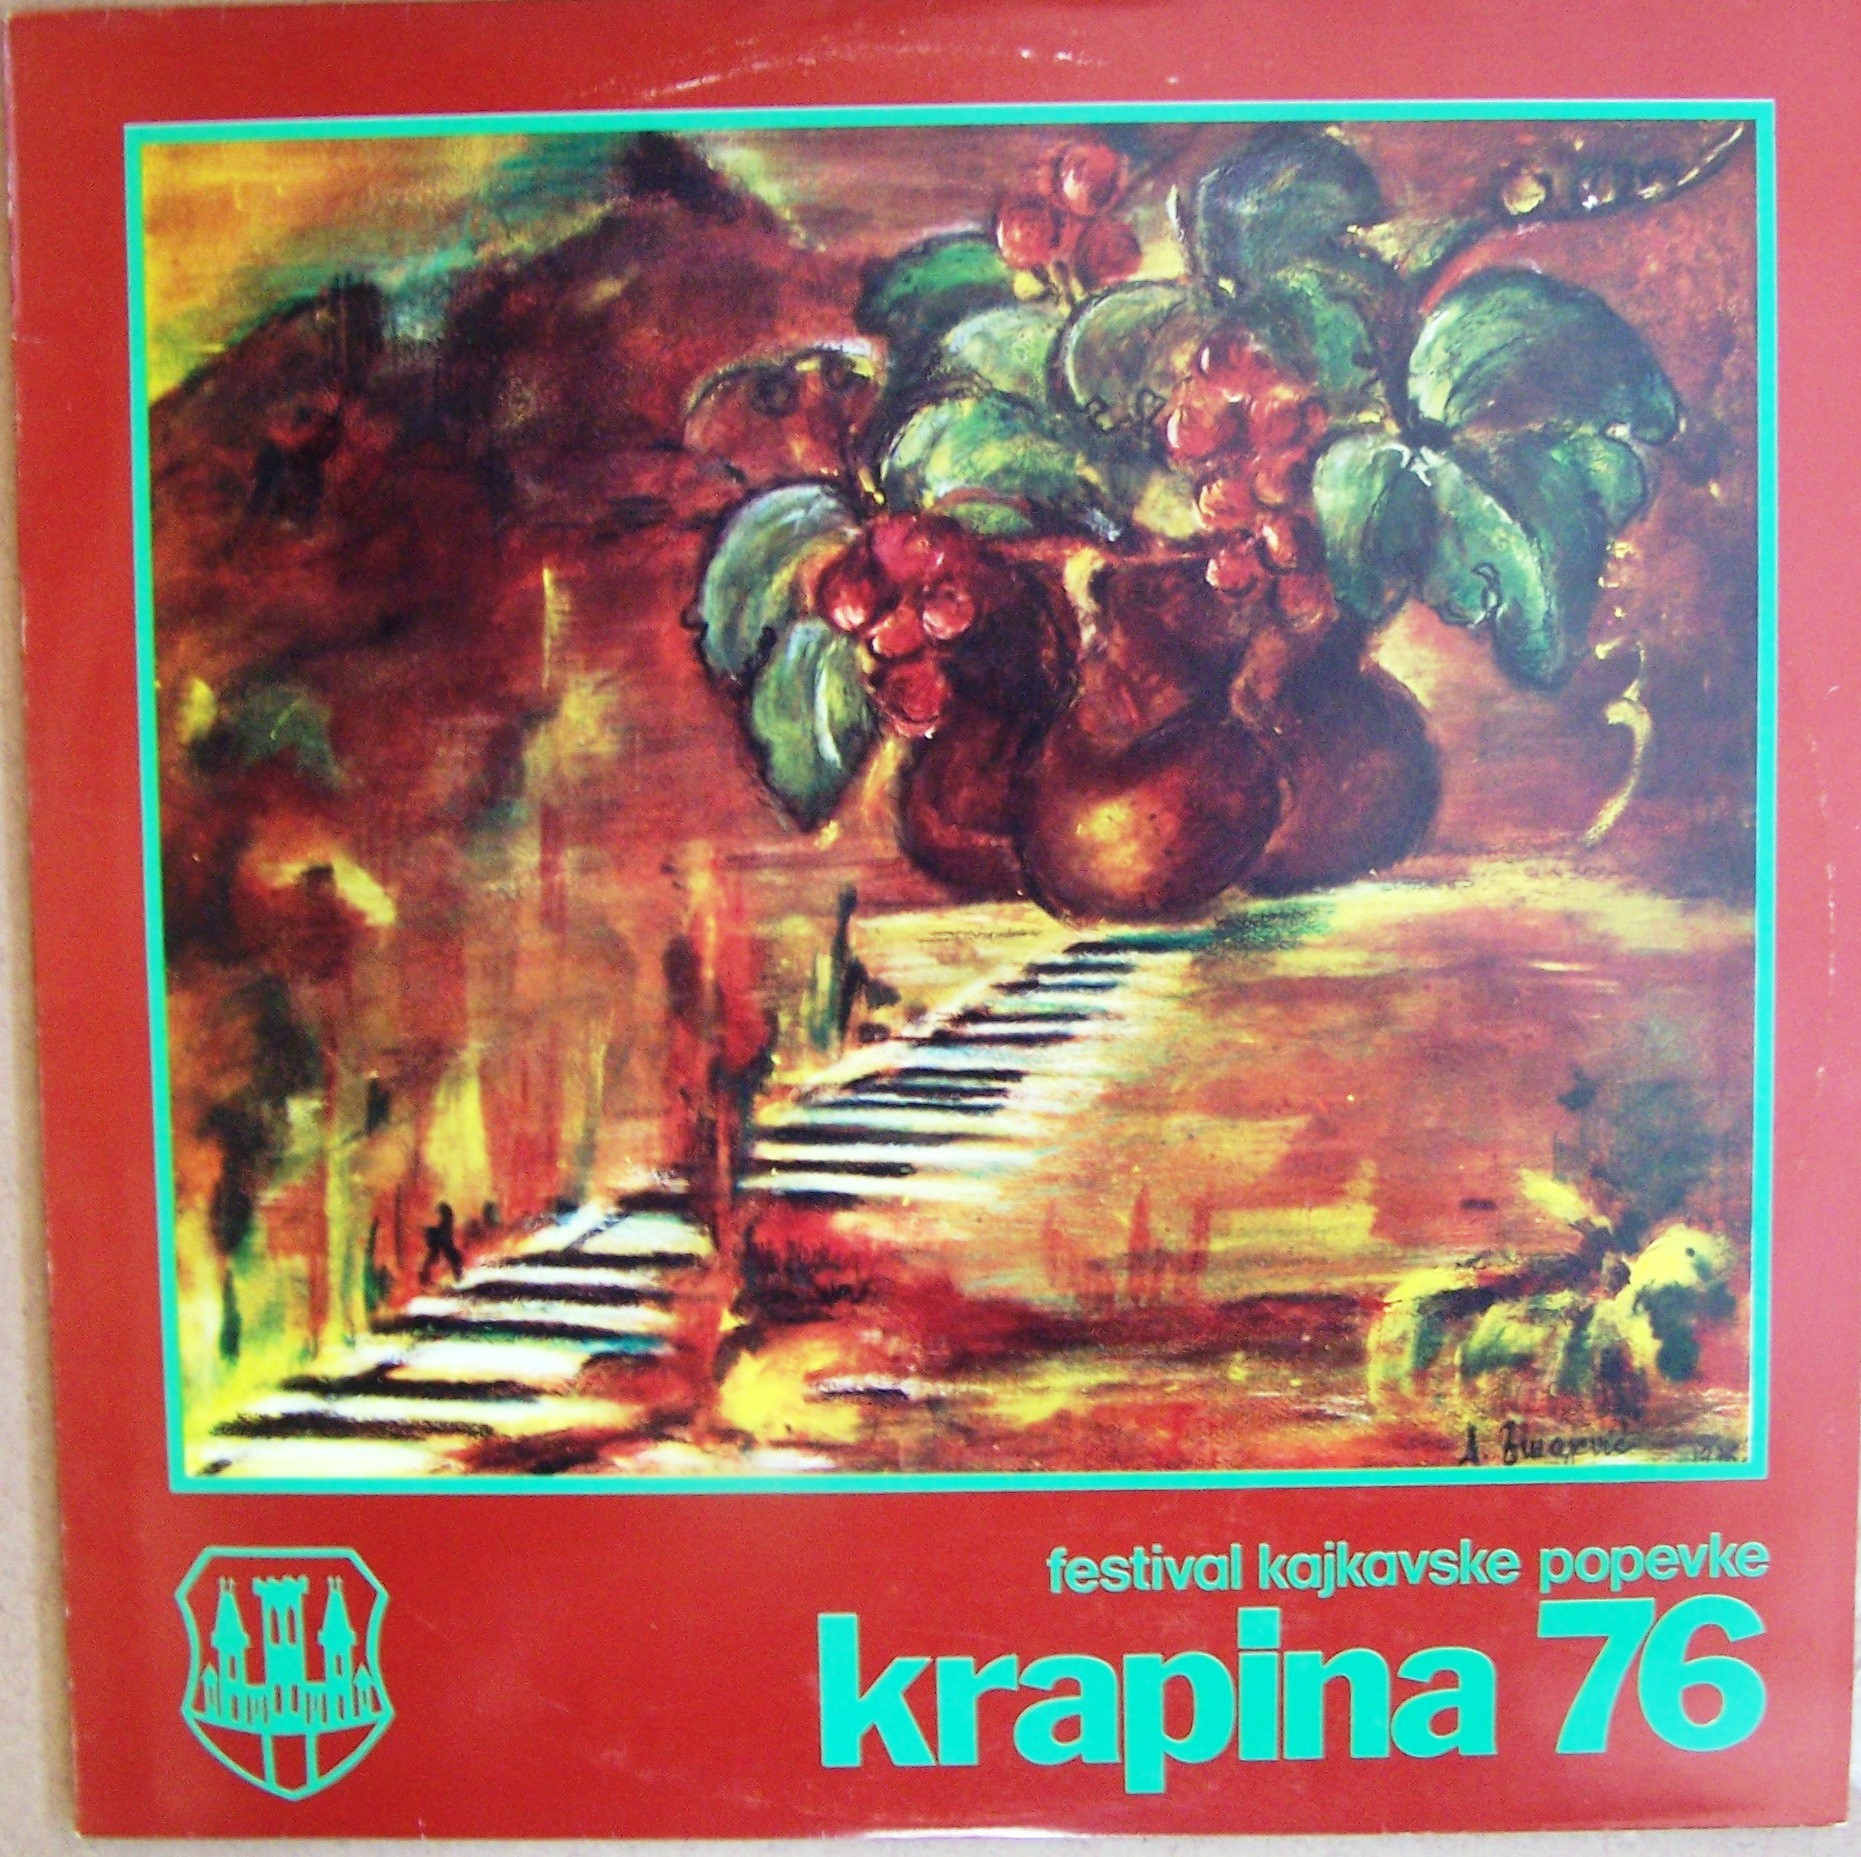 Various Artists - Krapina 1976 - Festival Kajkavske Popevke Zvuckovic/gabi/irobic Etc